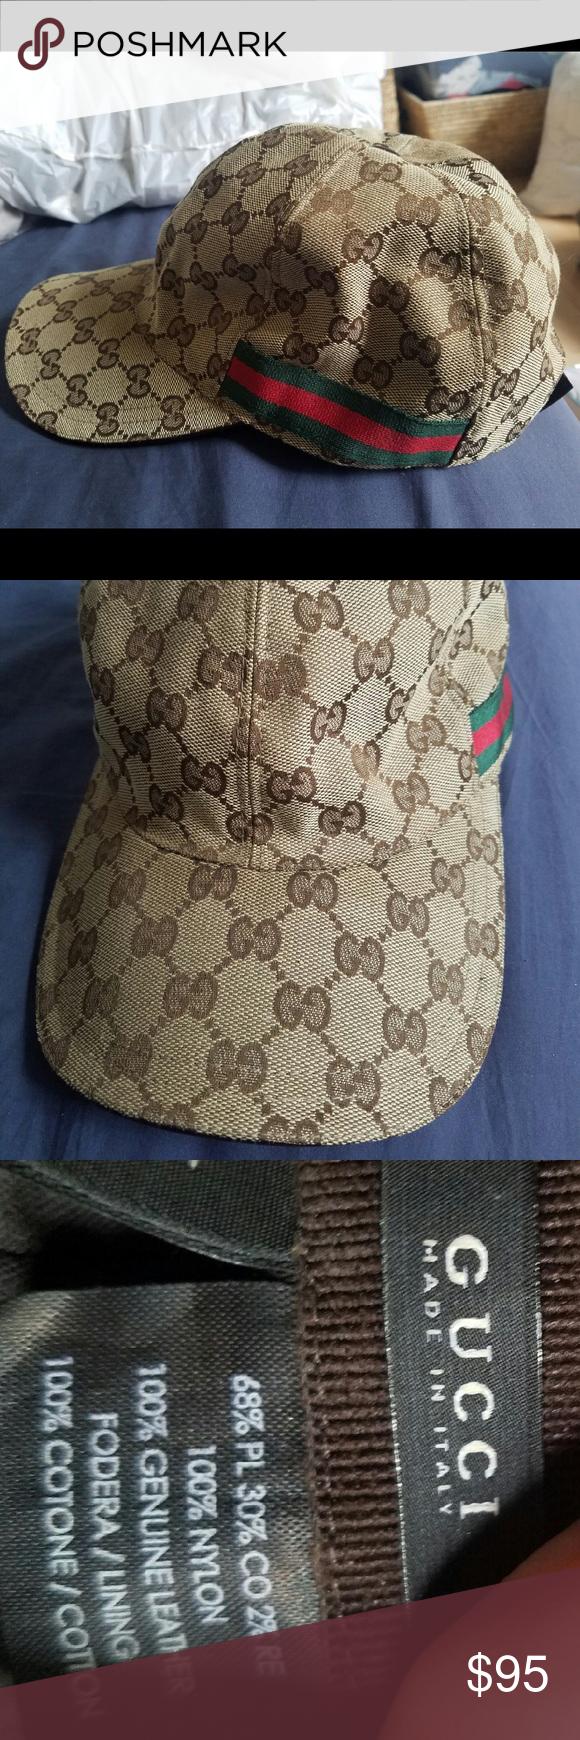 Gucci hat like brand new Gucci hat, Gucci, Hats